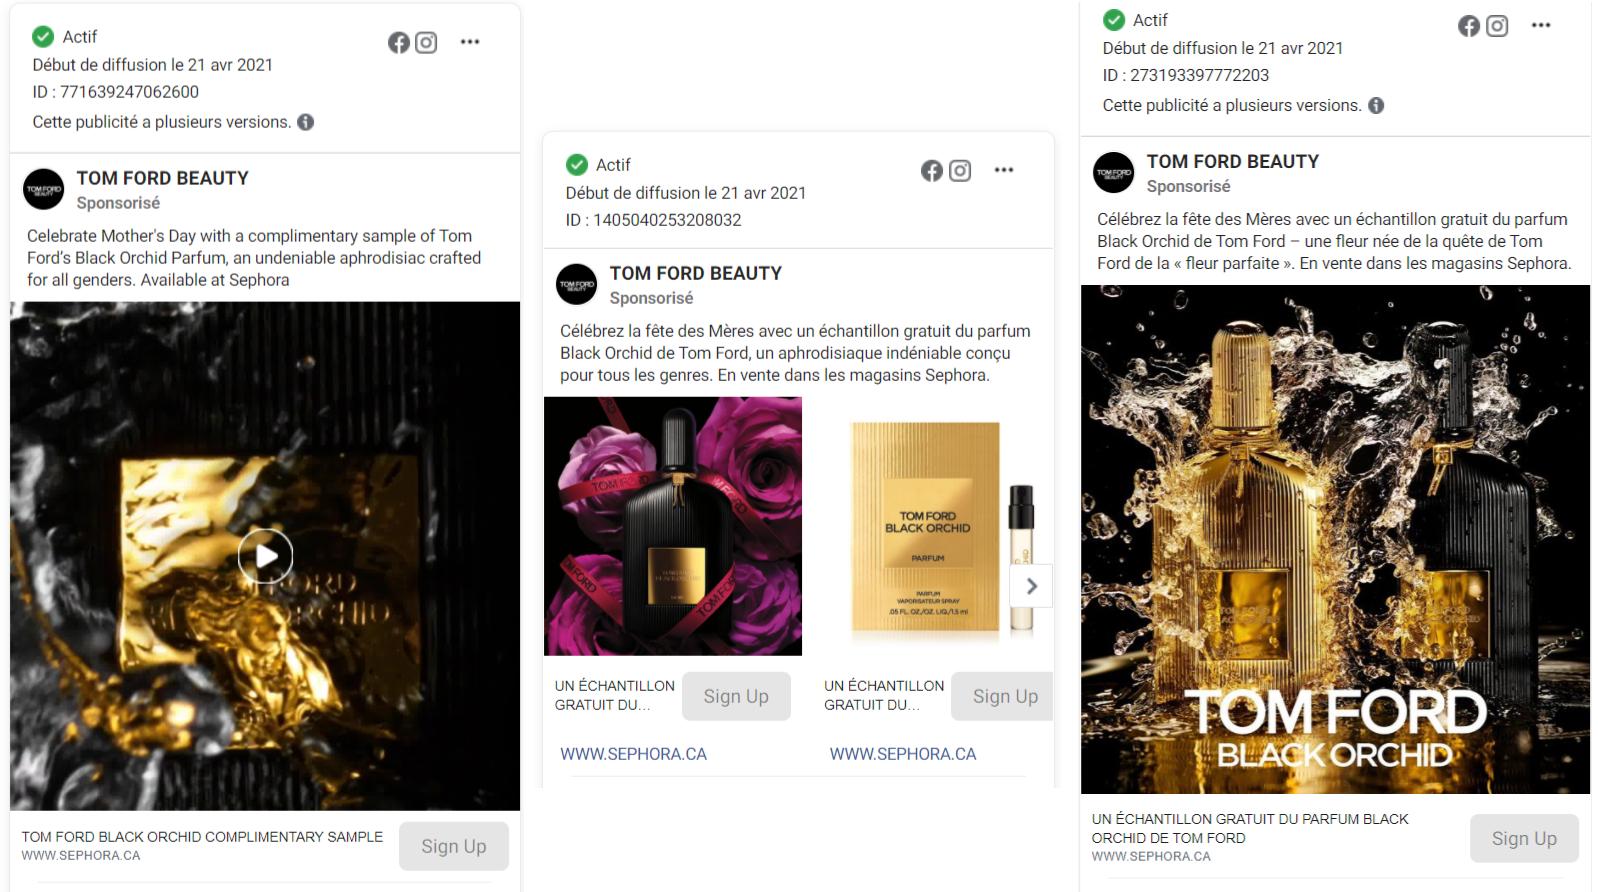 tom ford echantillons gratuits parfum black orchid